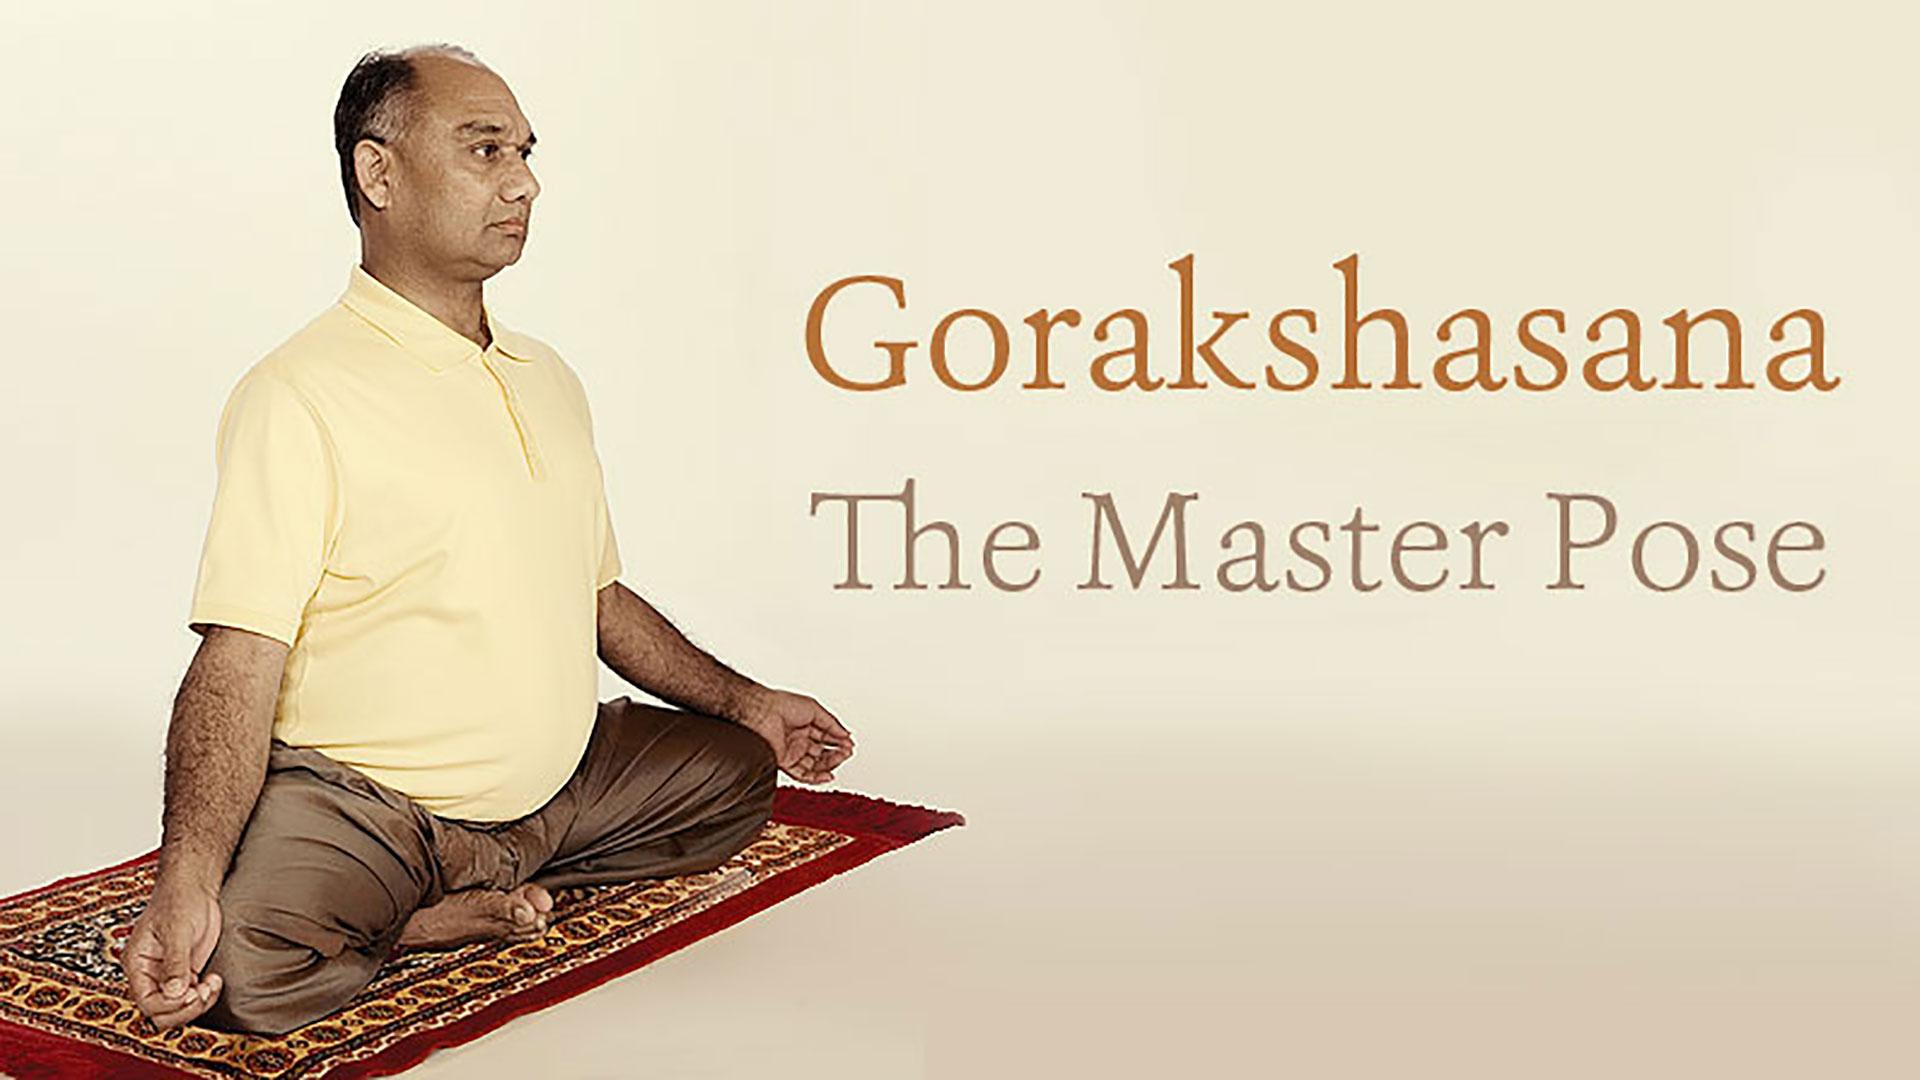 Gorakshasana Master Pose Of Tantric Yogis